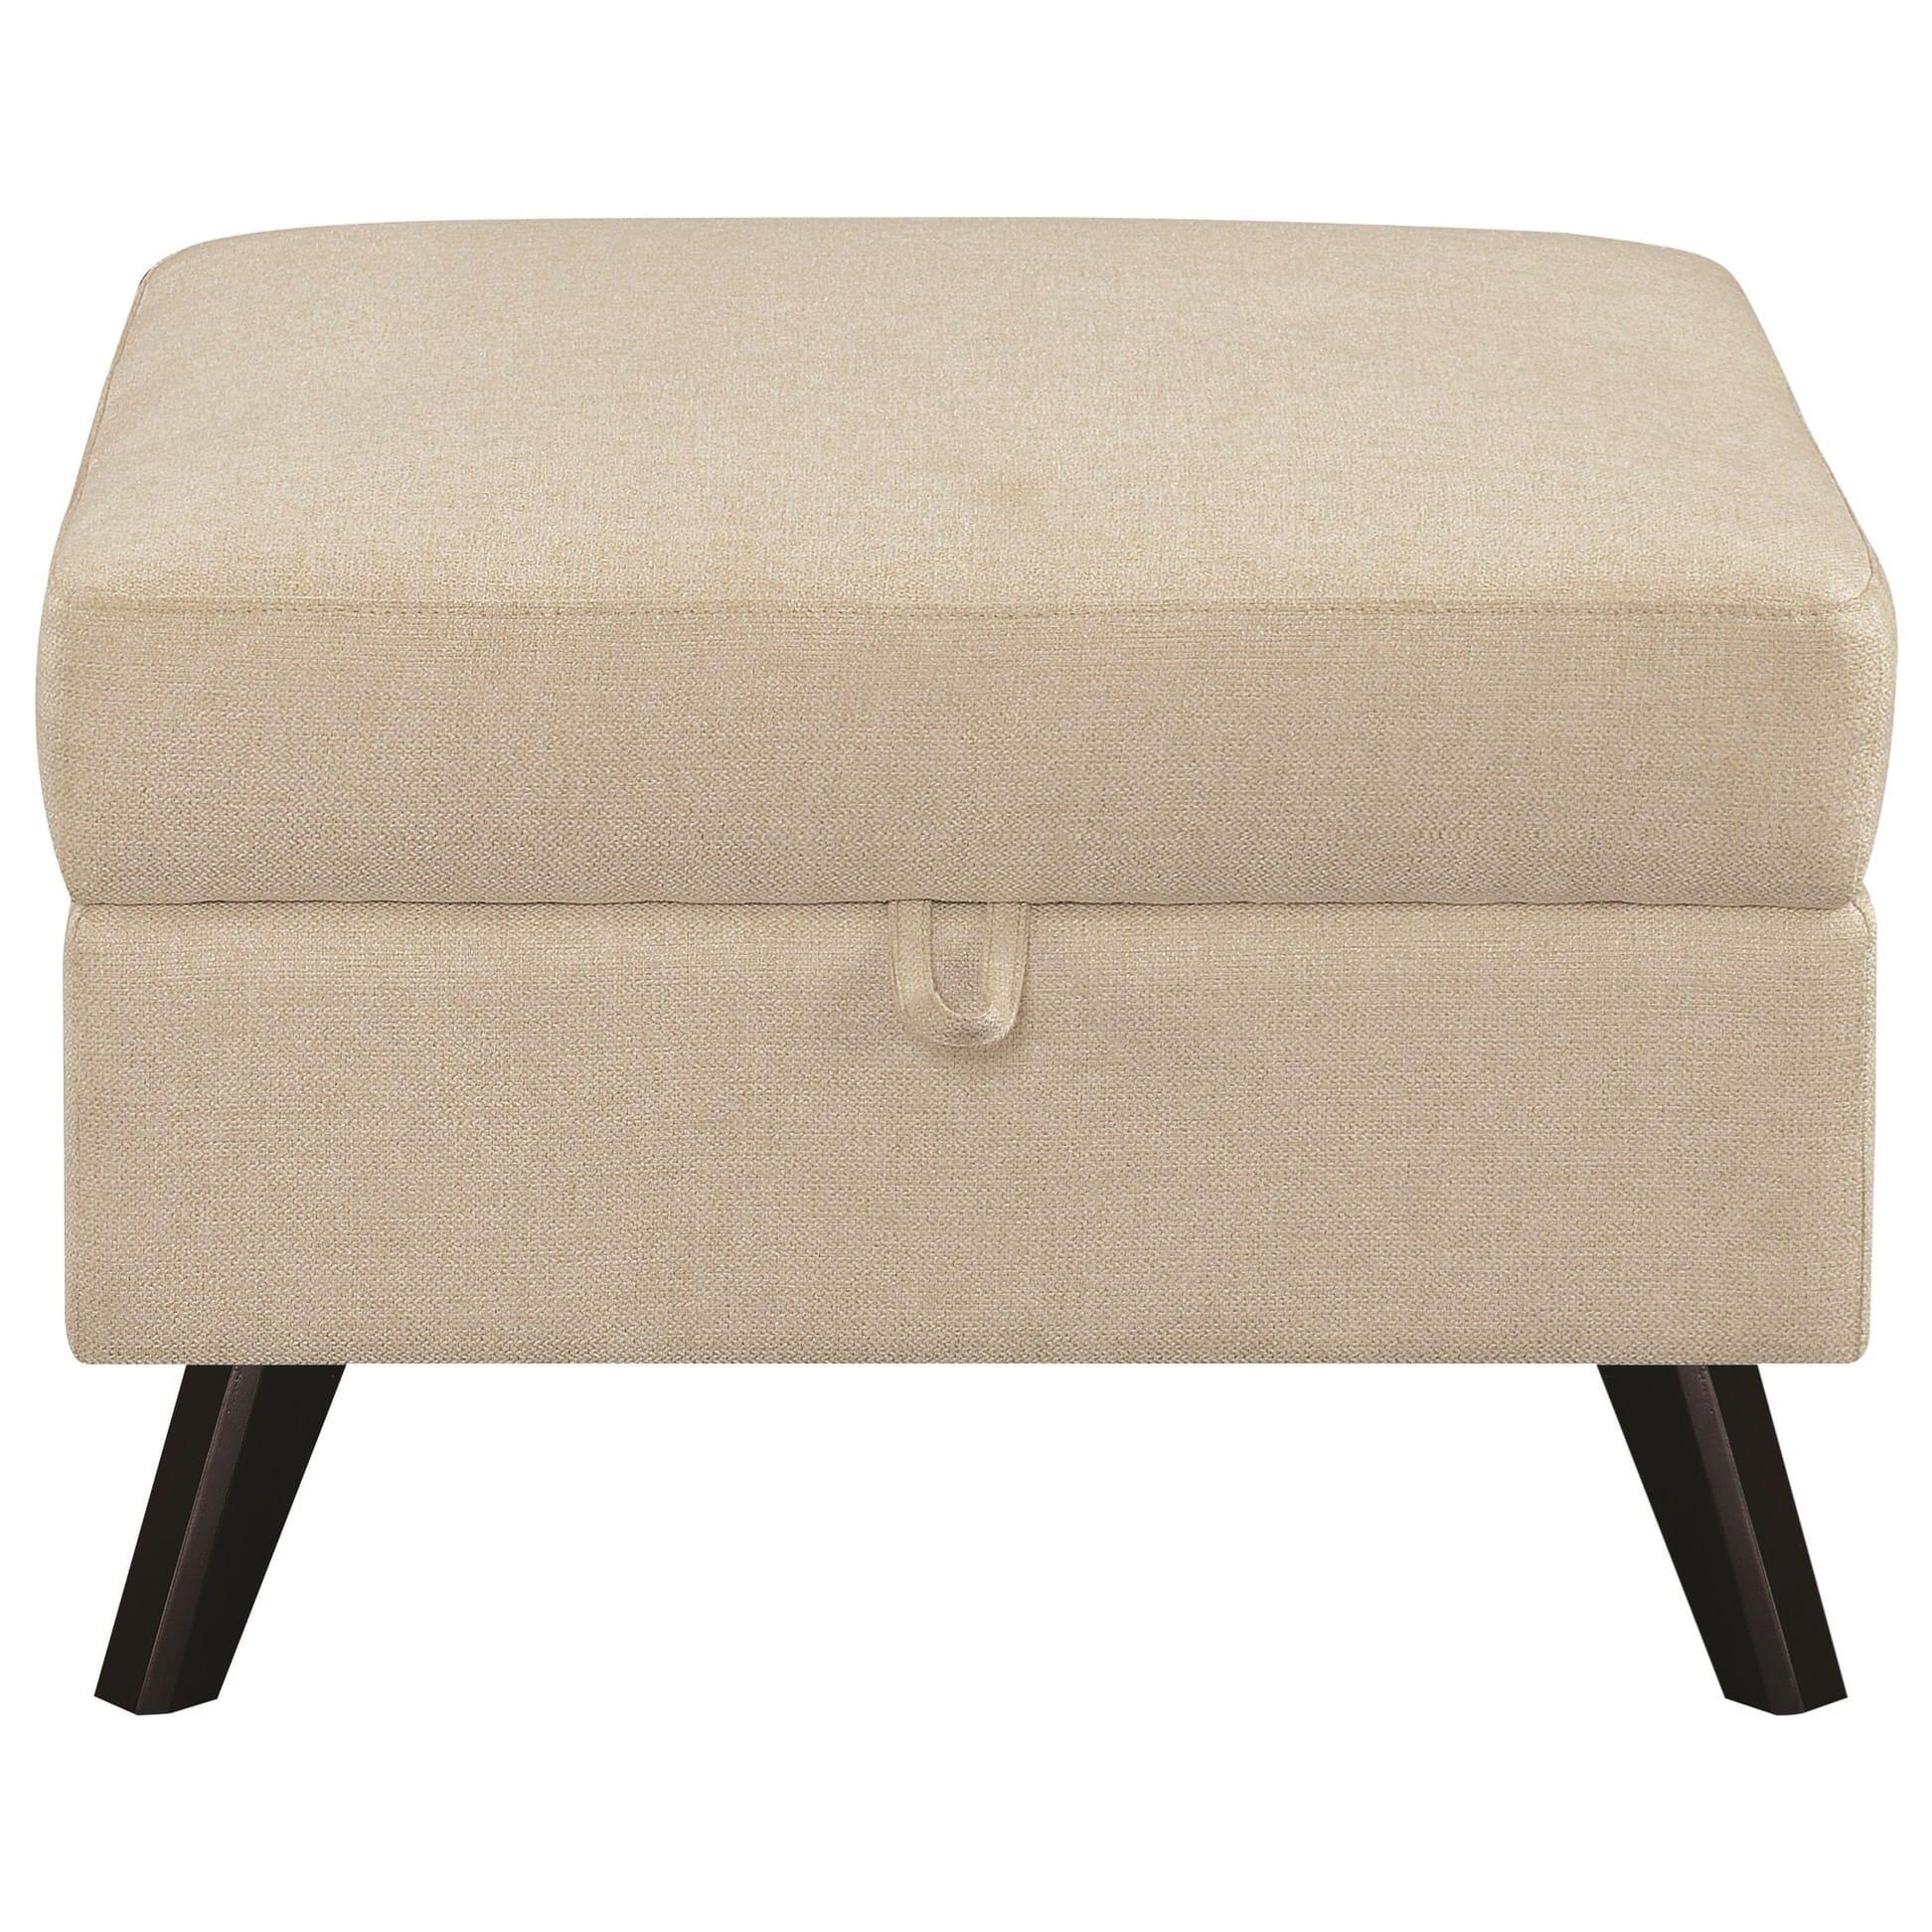 Surprising 506174 Montana Mid Century Linen Storage Ottoman By Scott Living Machost Co Dining Chair Design Ideas Machostcouk